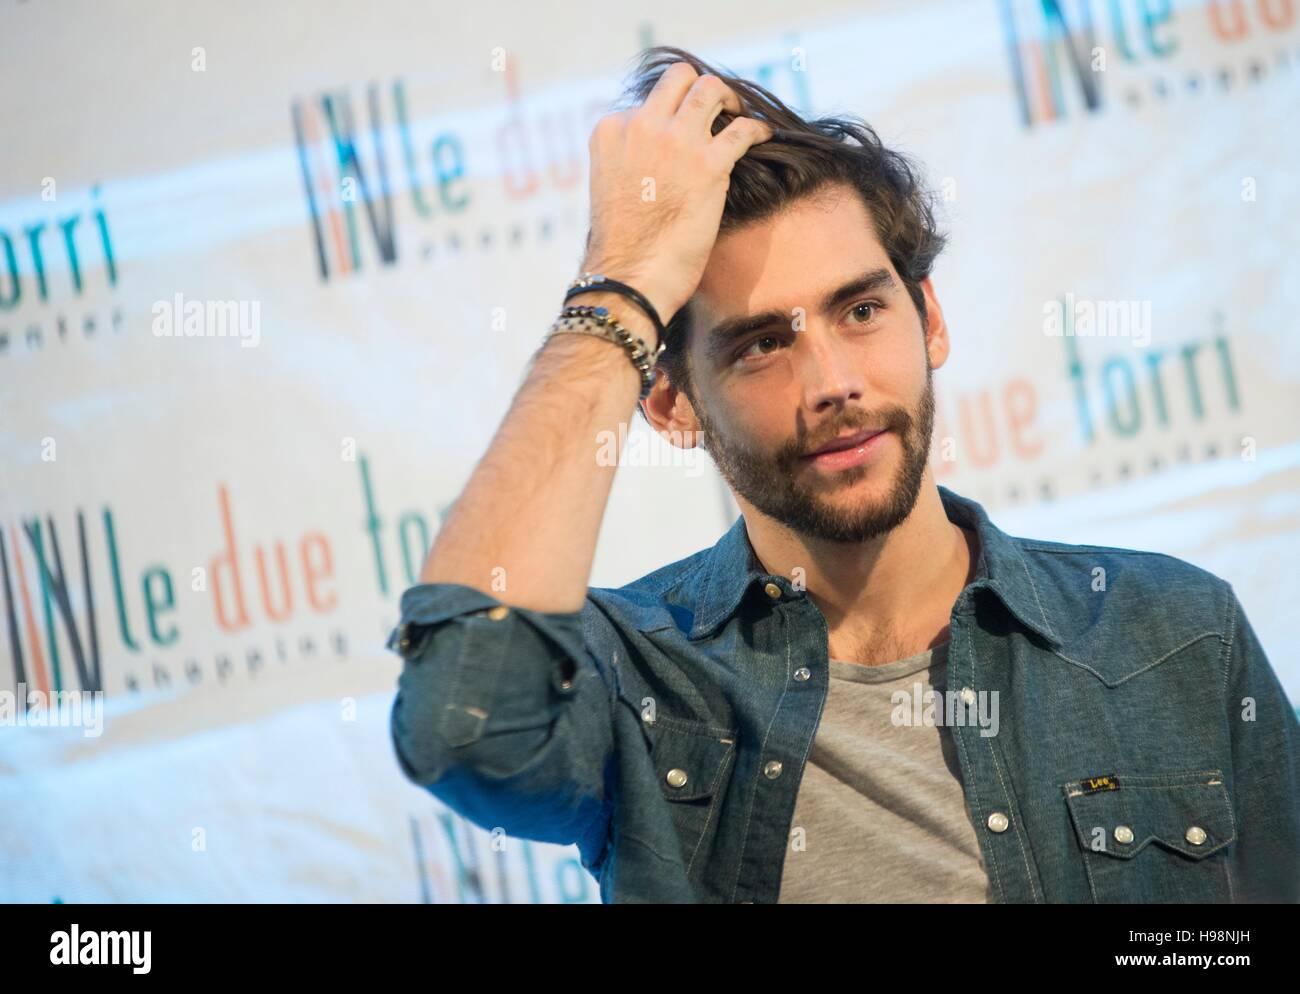 Bergamo, Italy. 19th Nov, 2016. Alvaro Soler, Spanish singer-songwriter, judge X-Factor Italy 2016. Today, Saturday Stock Photo